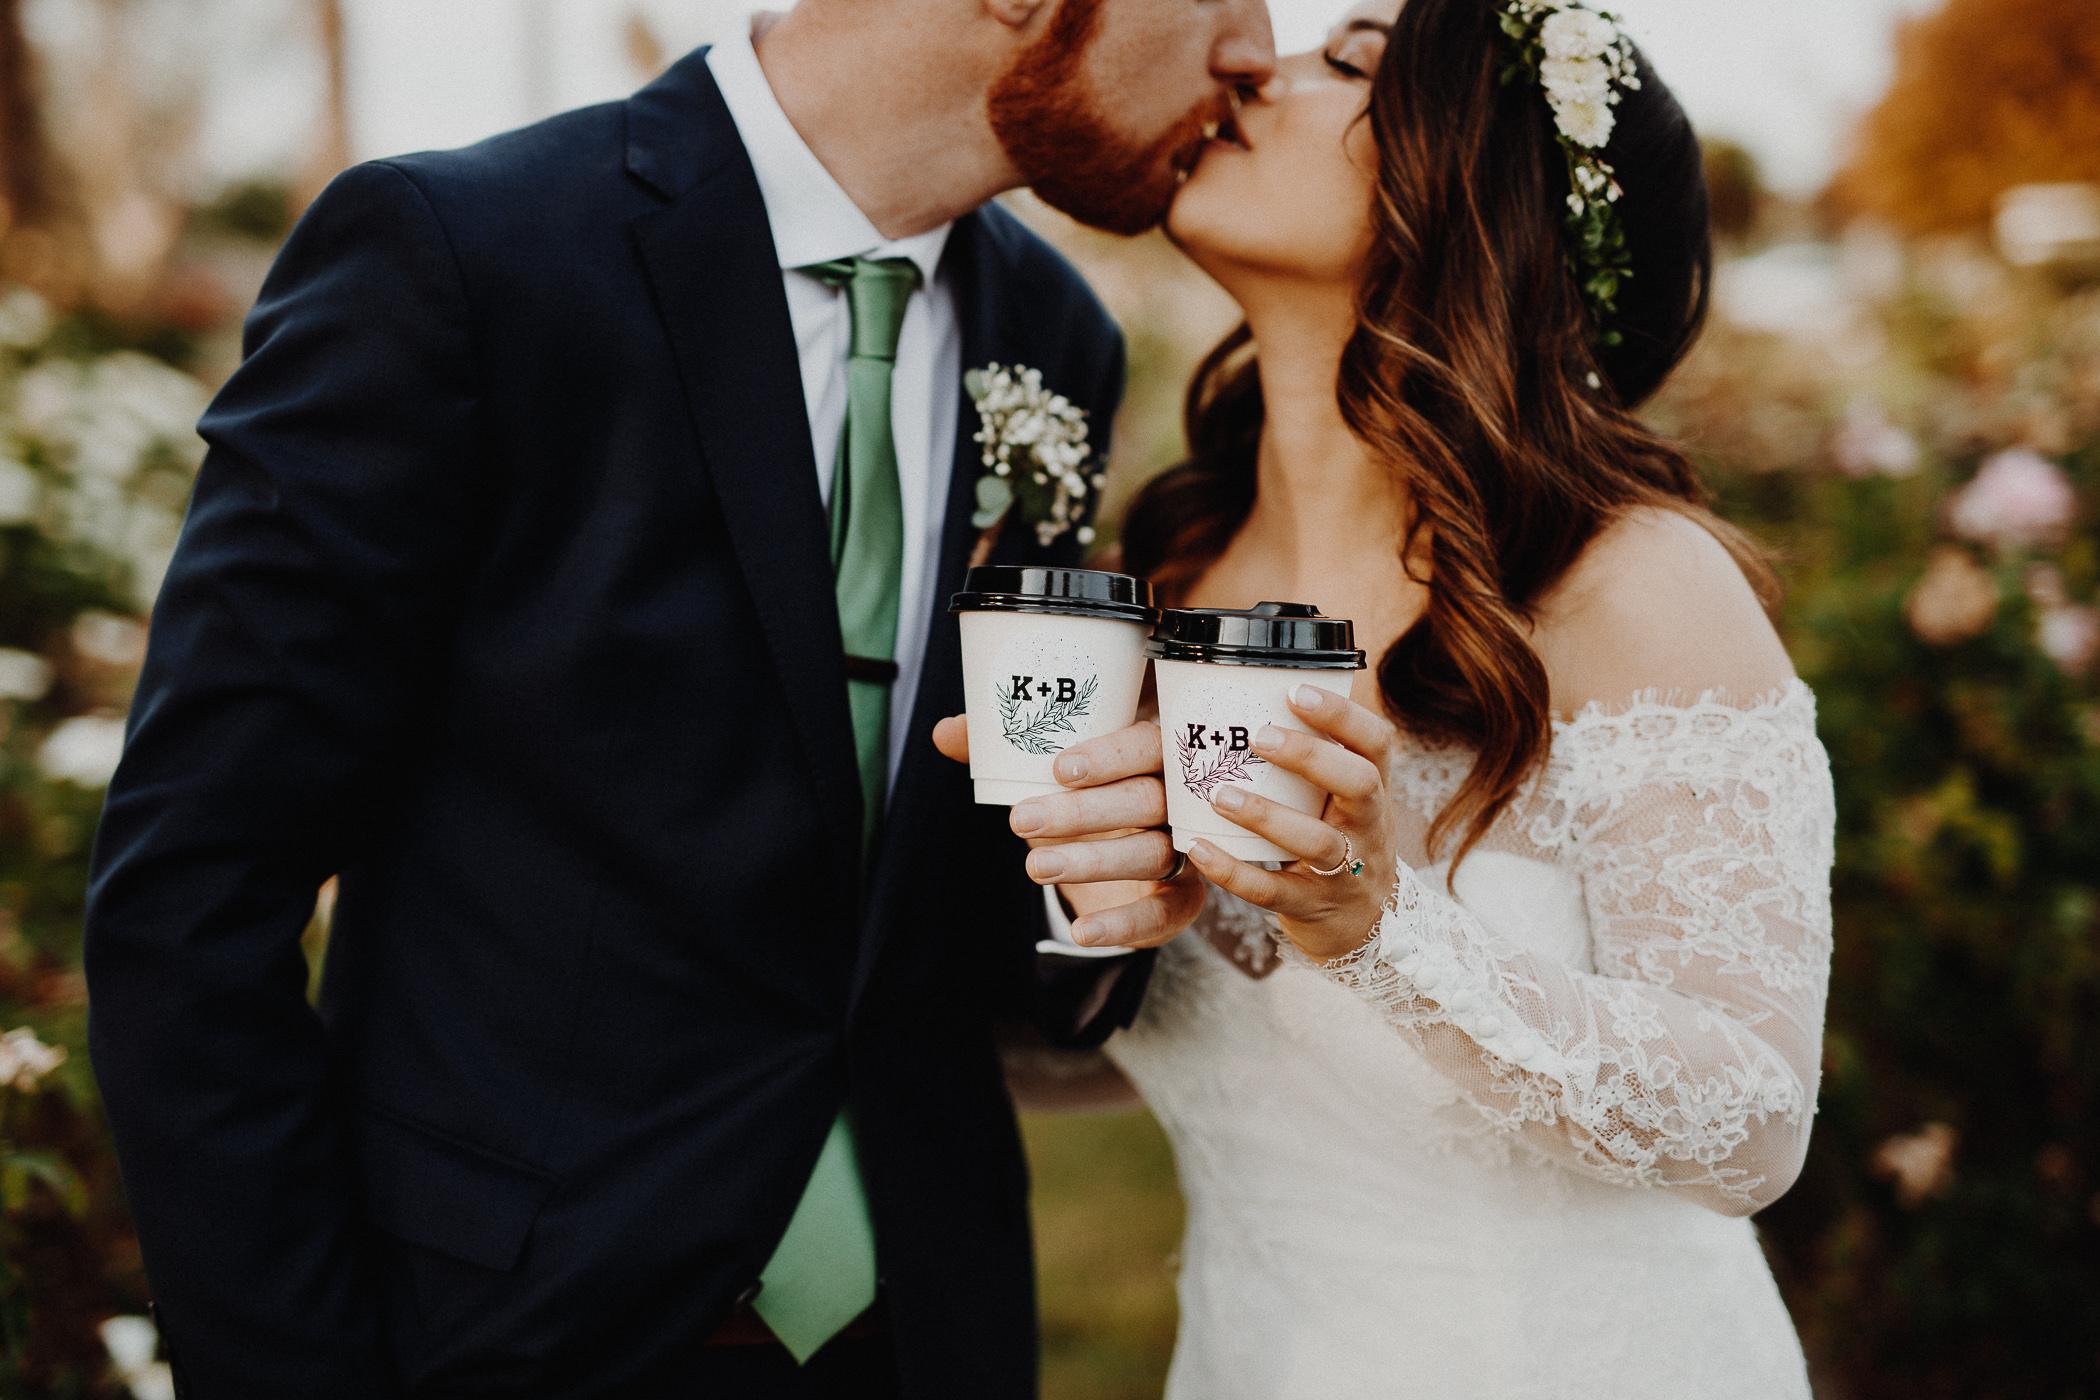 181104-Luxium-Weddings-Arizona-@matt__Le-Brandon-Kariana-Phoenix-Valley-Garden-Center-1109.jpg